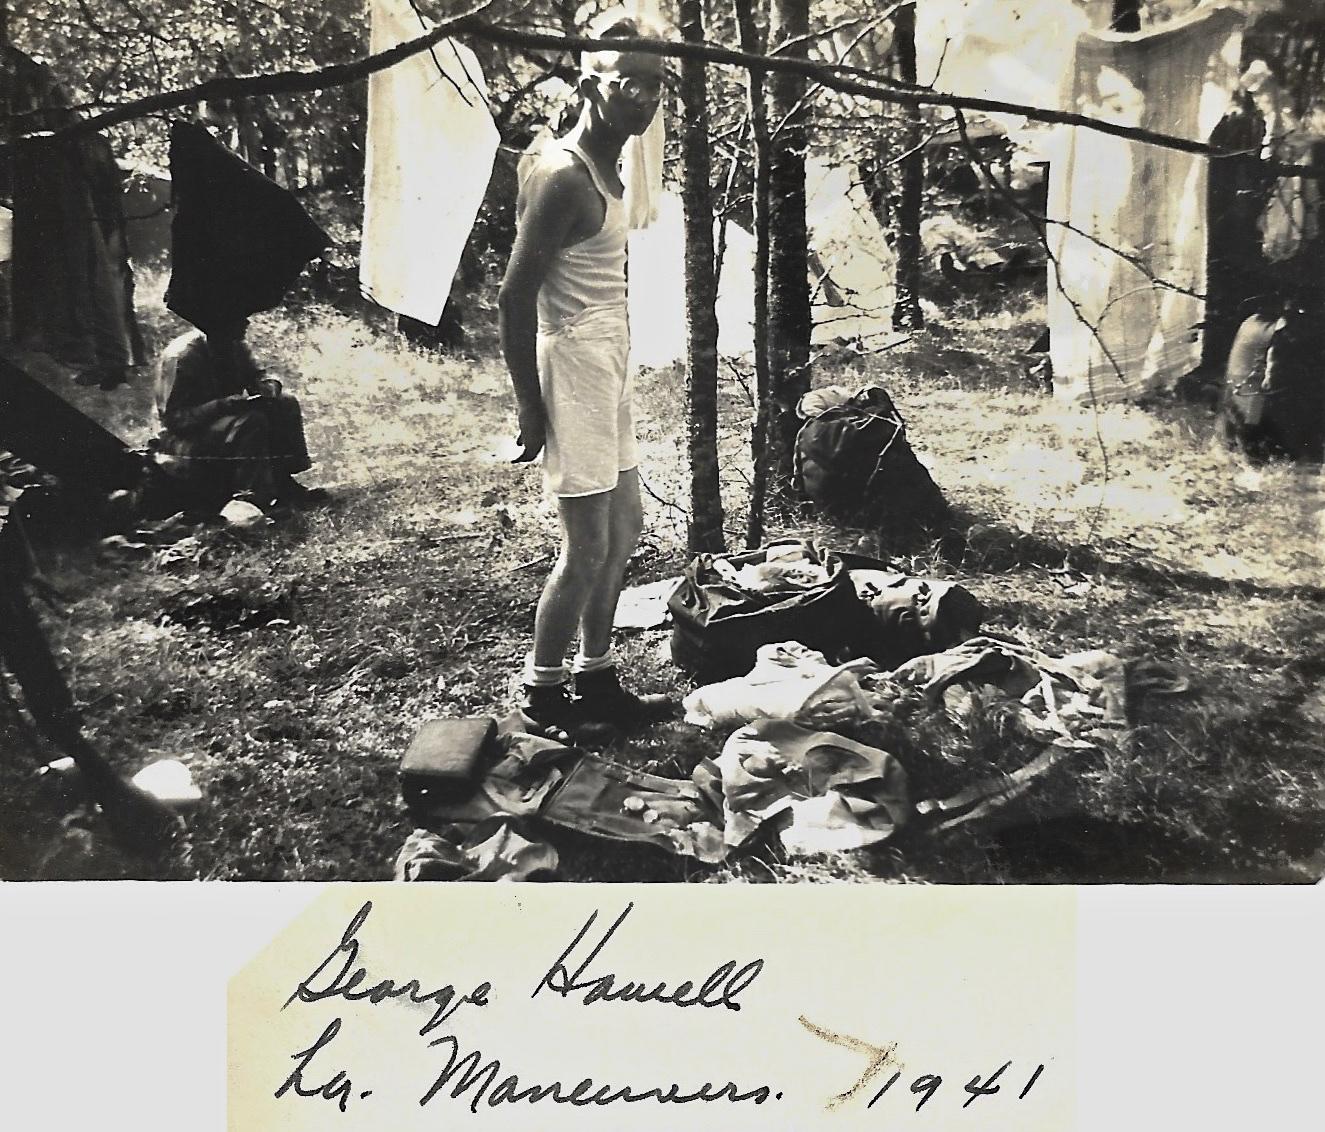 1941 WWII, George Howell, Louisiana Maneuvers